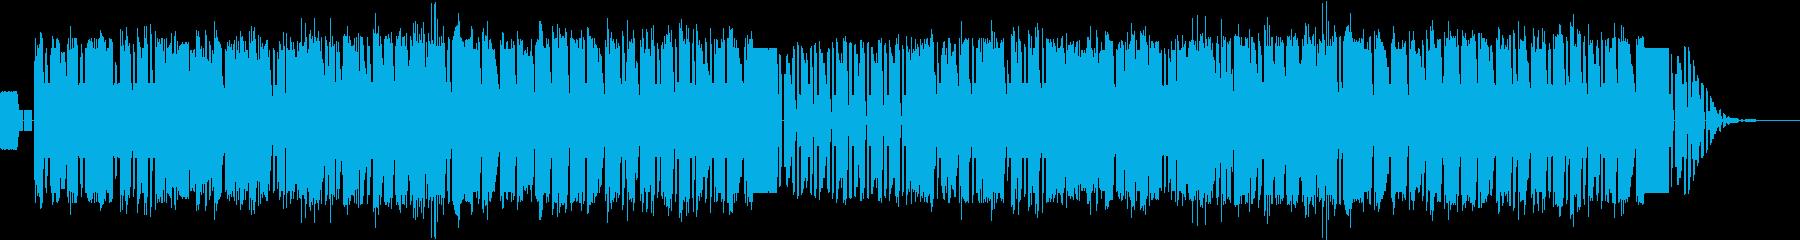 YouTuber 用ファミコン風BGM3の再生済みの波形